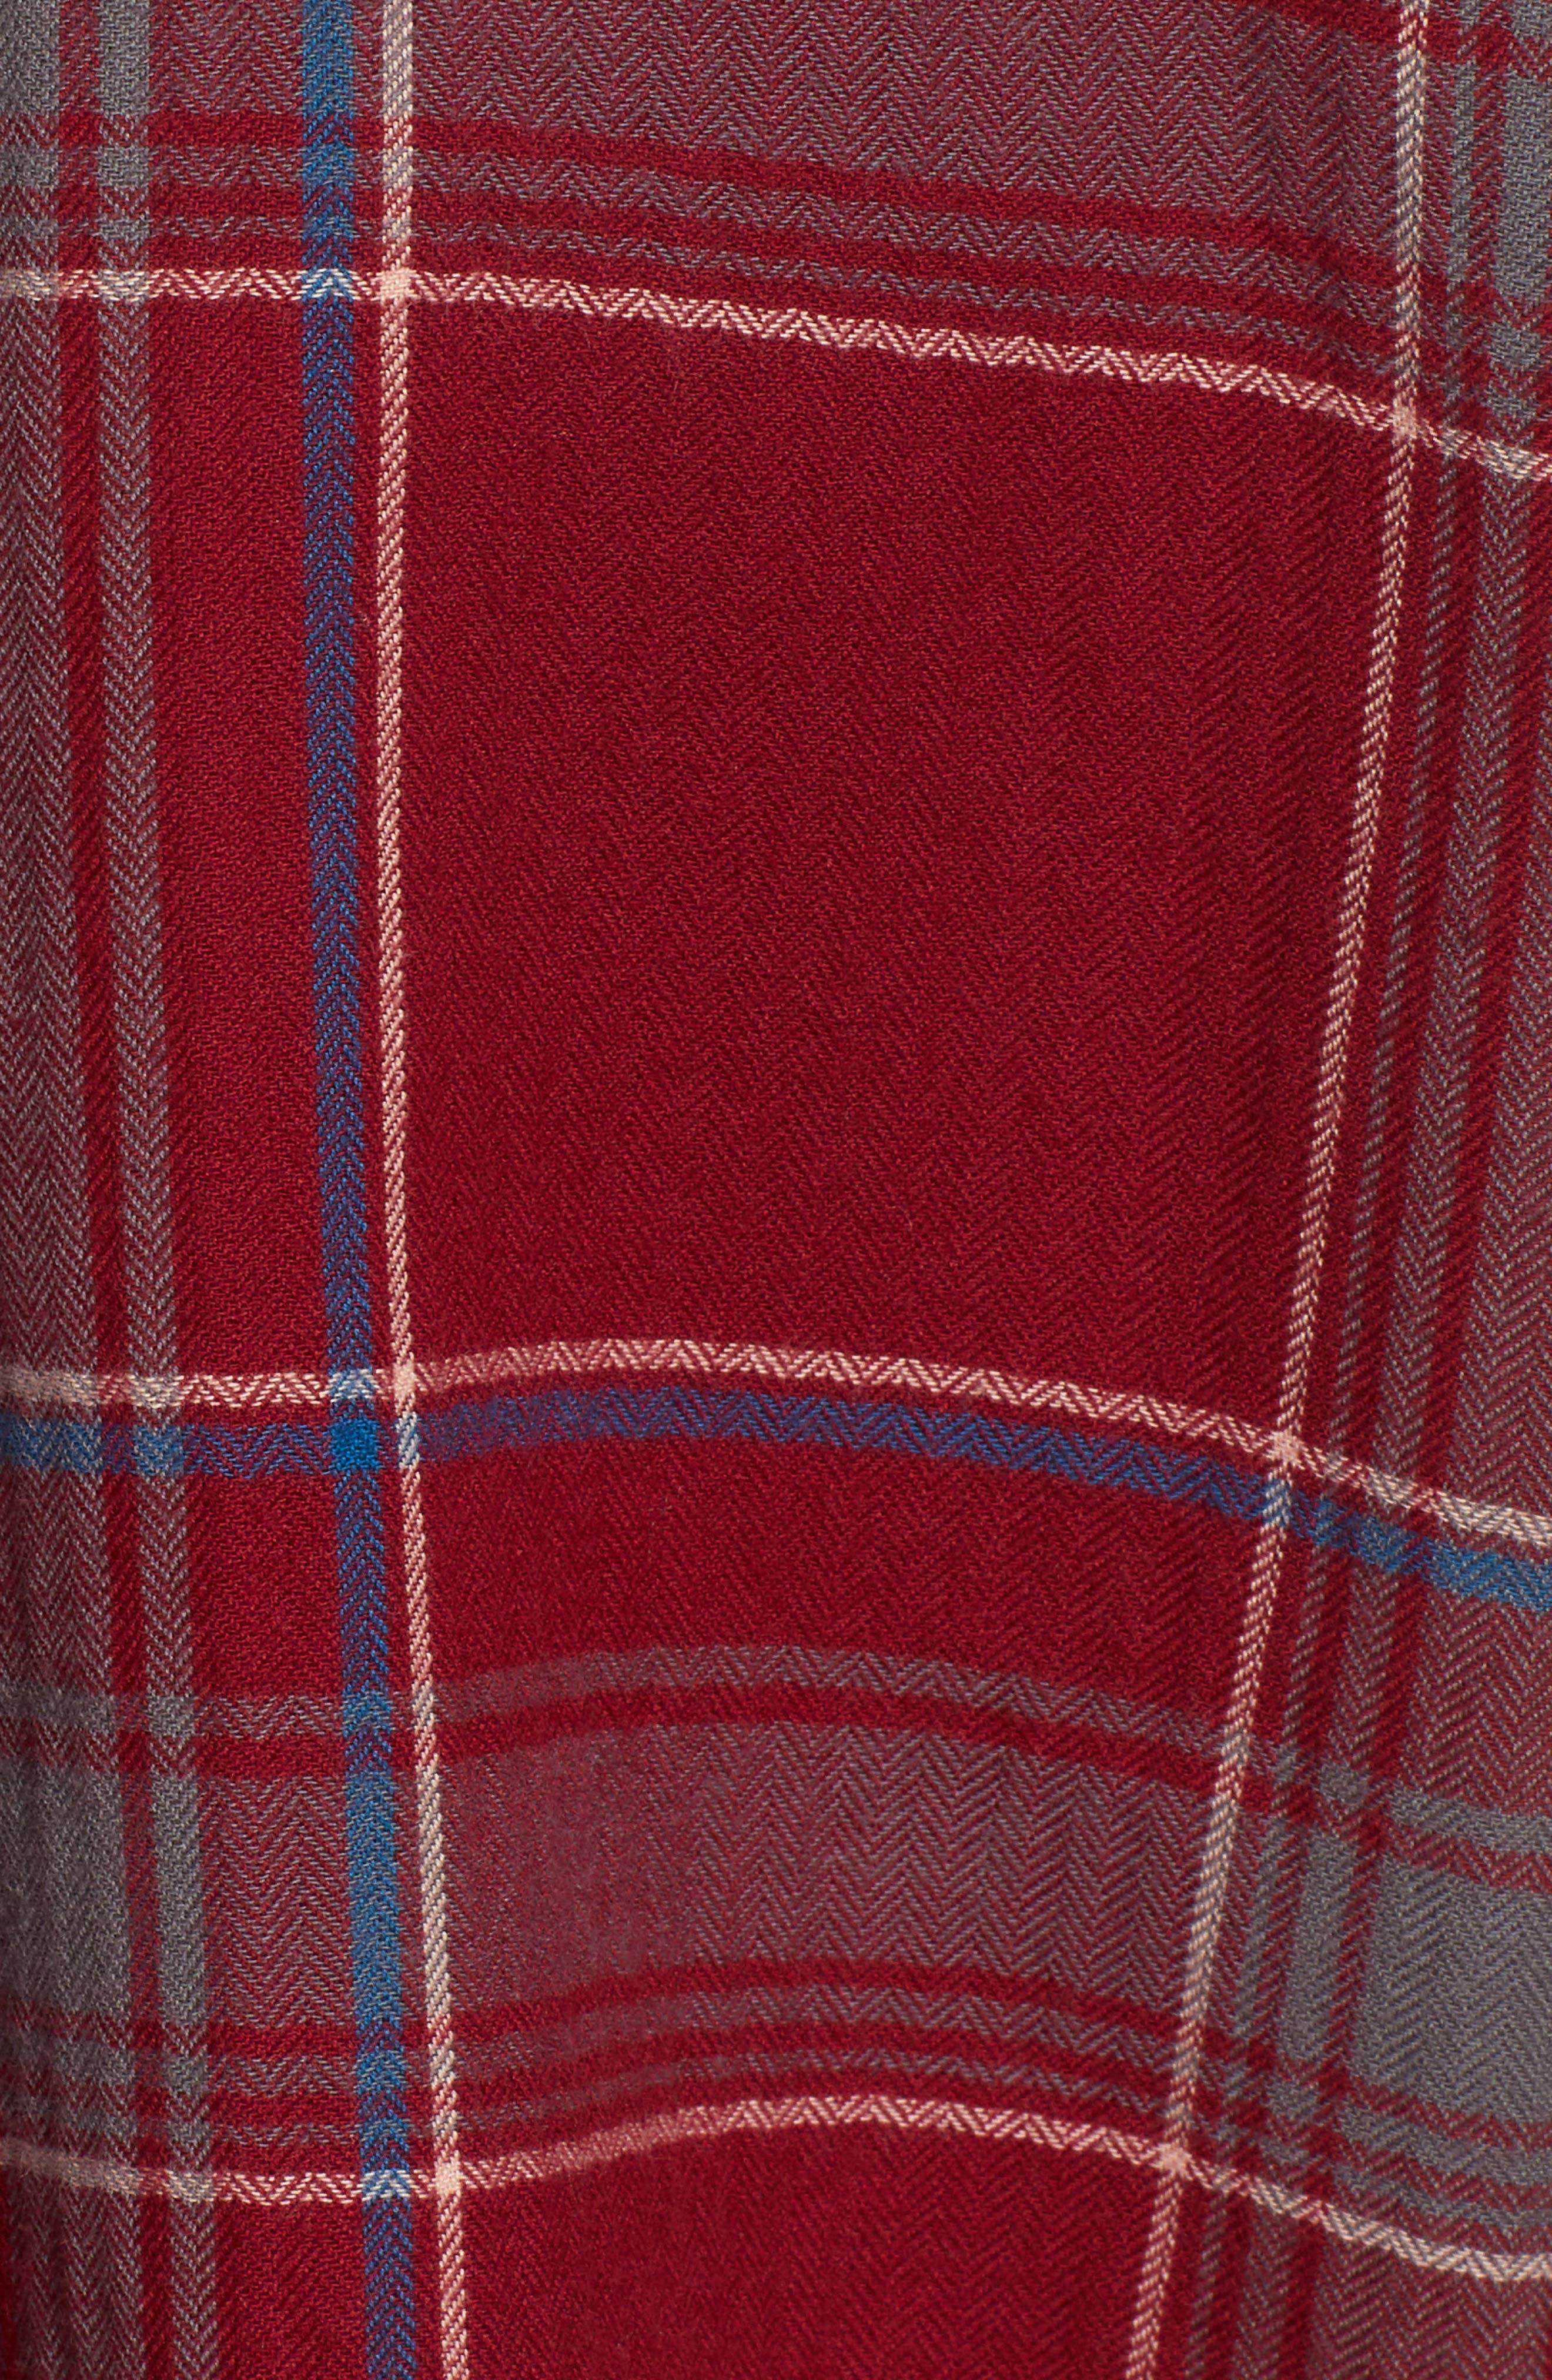 Frayed Edge Plaid Shirt,                             Alternate thumbnail 6, color,                             610